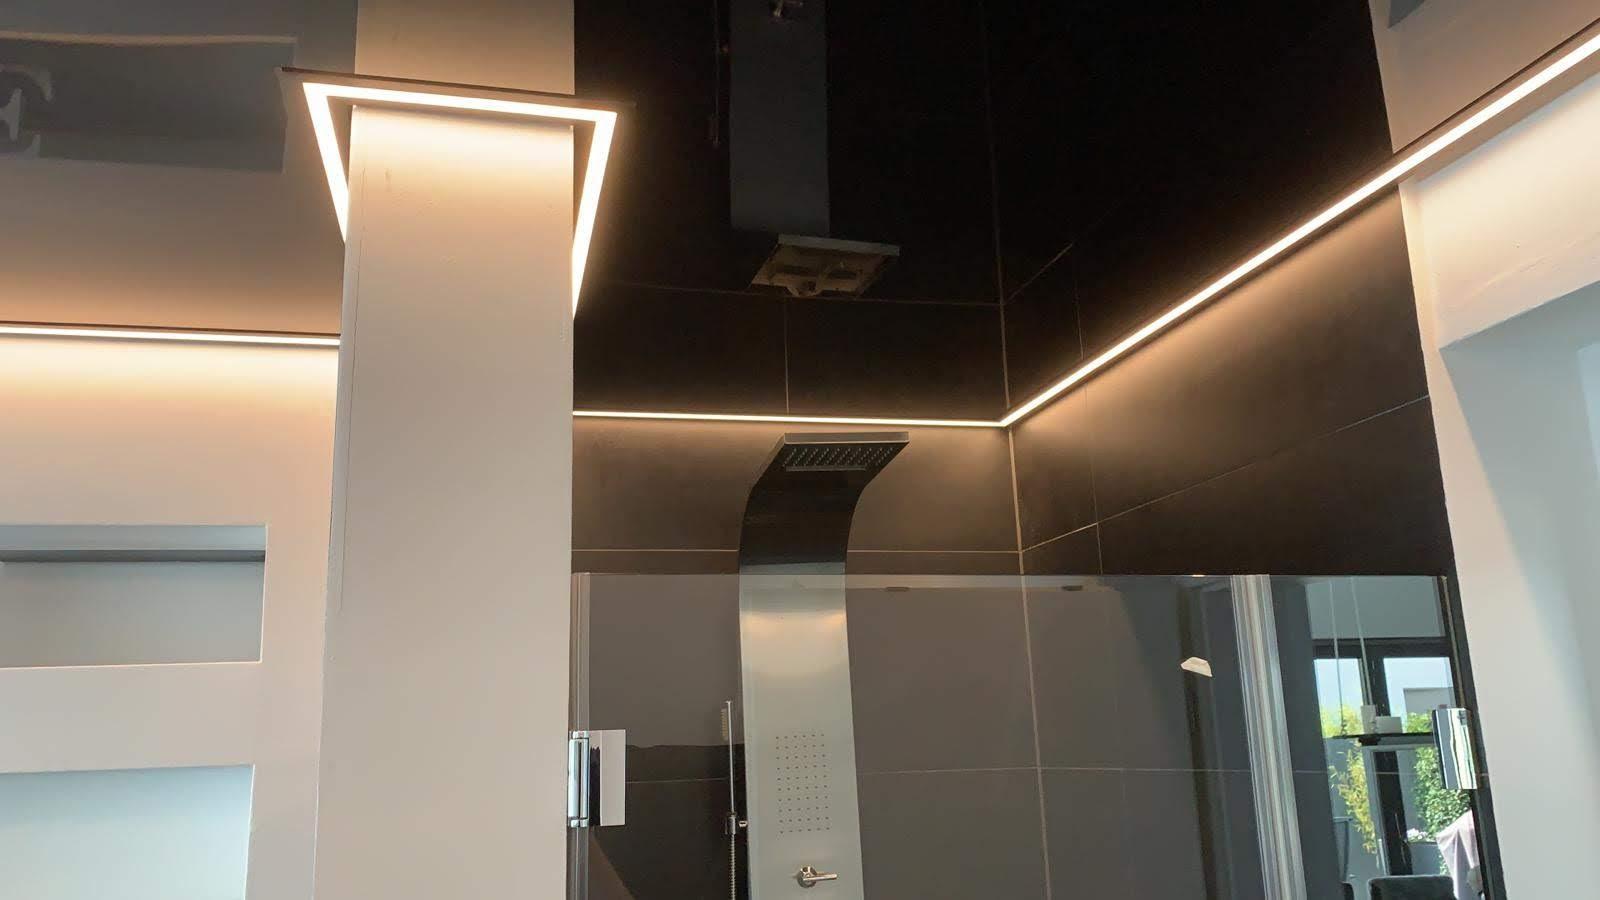 LED Beleuchtung Plameco Decke Badezimmerdecke in schwarz